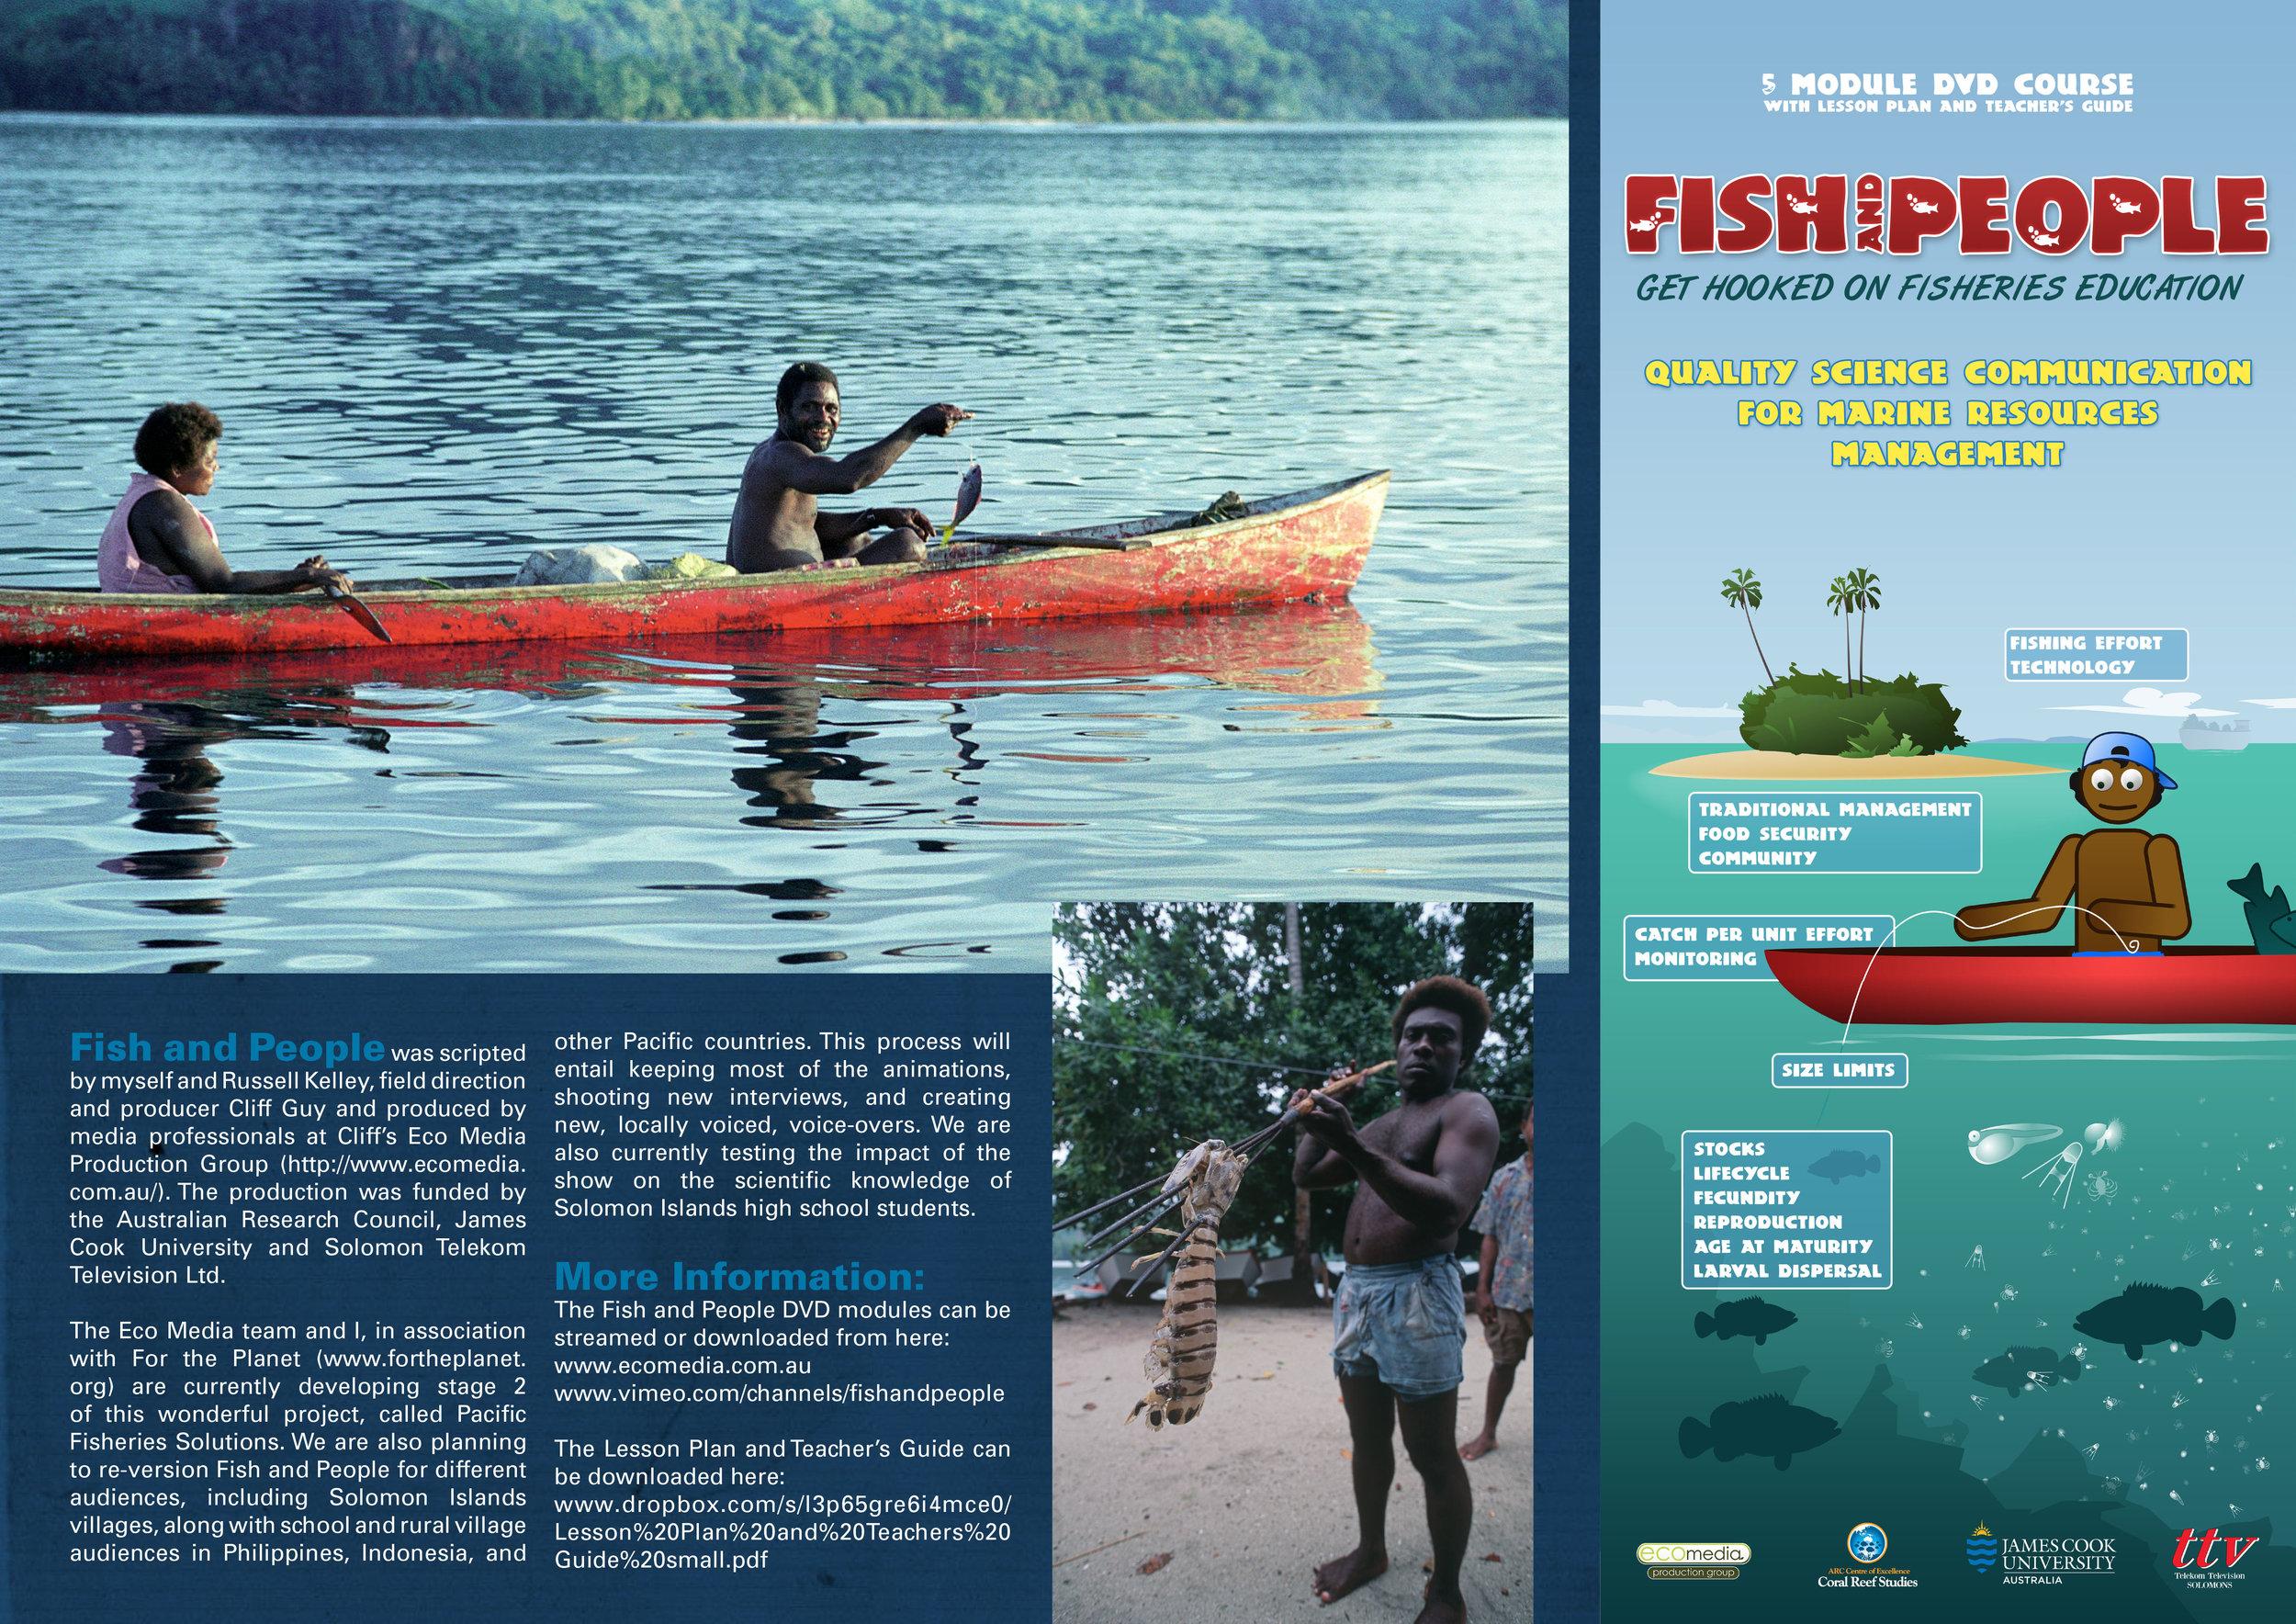 FishandPeople-3.jpg